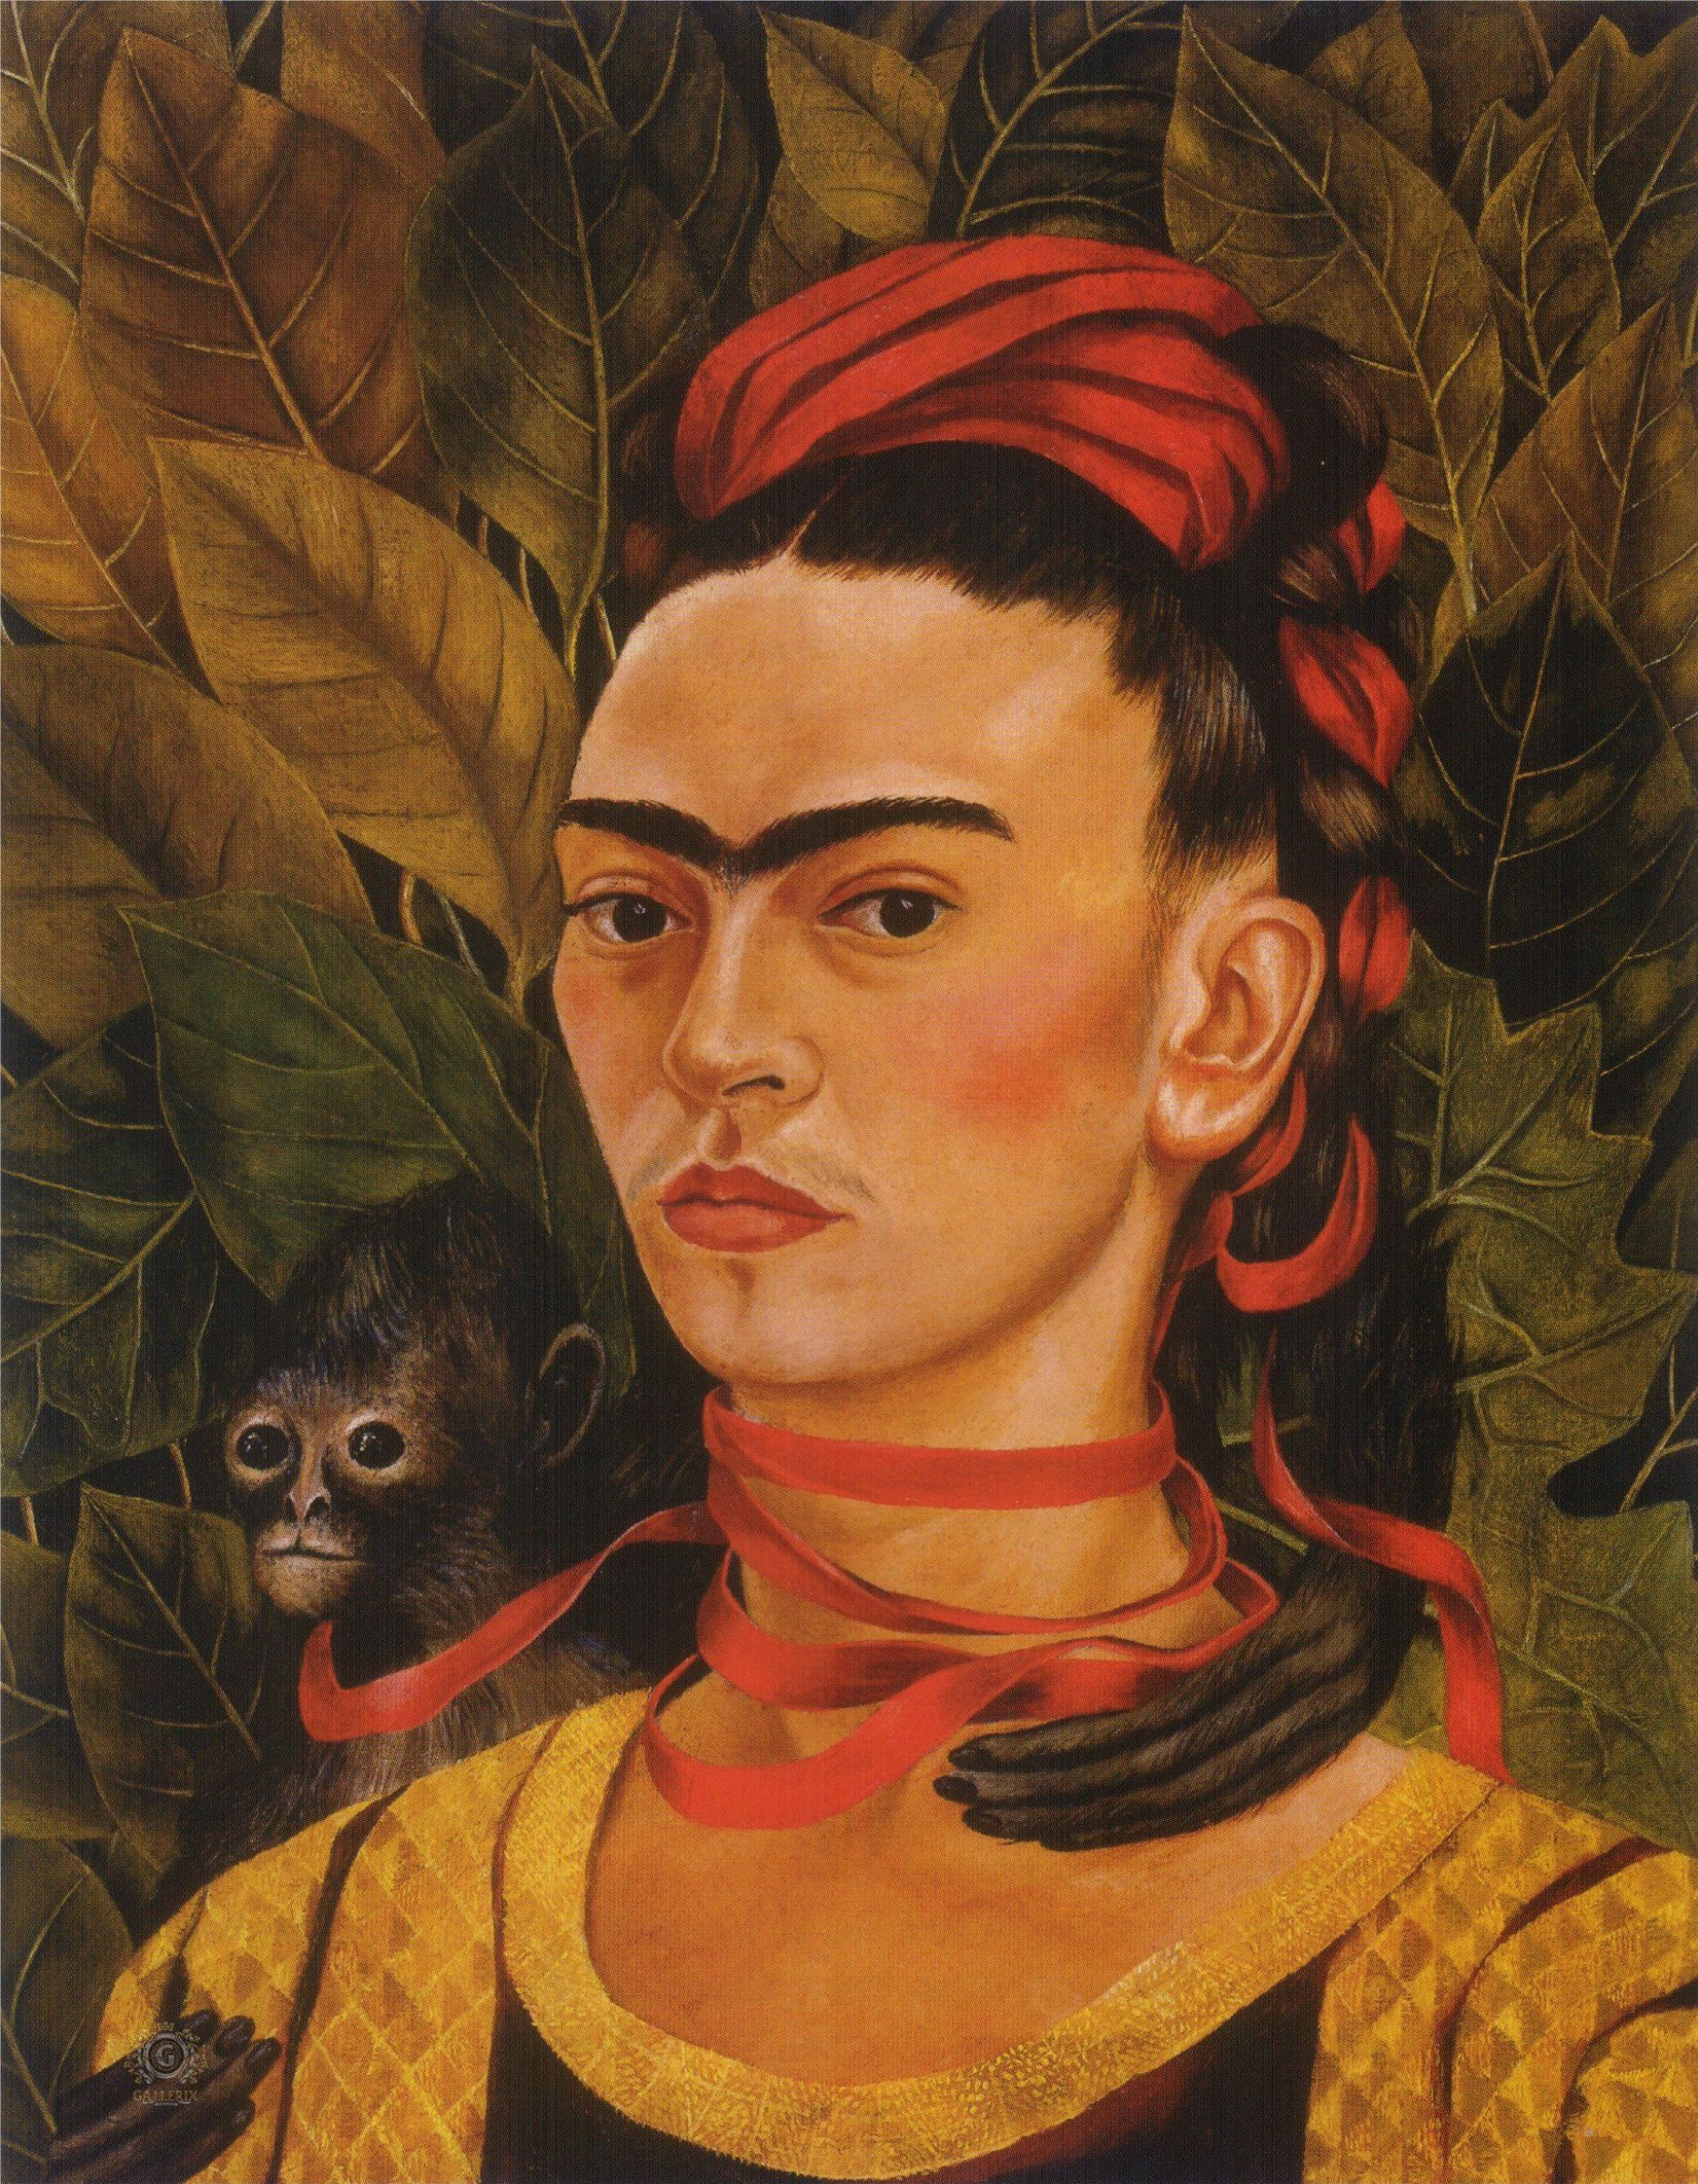 Frida Kahlo Sin Nombre Frida Kahlo Paintings Kahlo Paintings Frida Kahlo Art